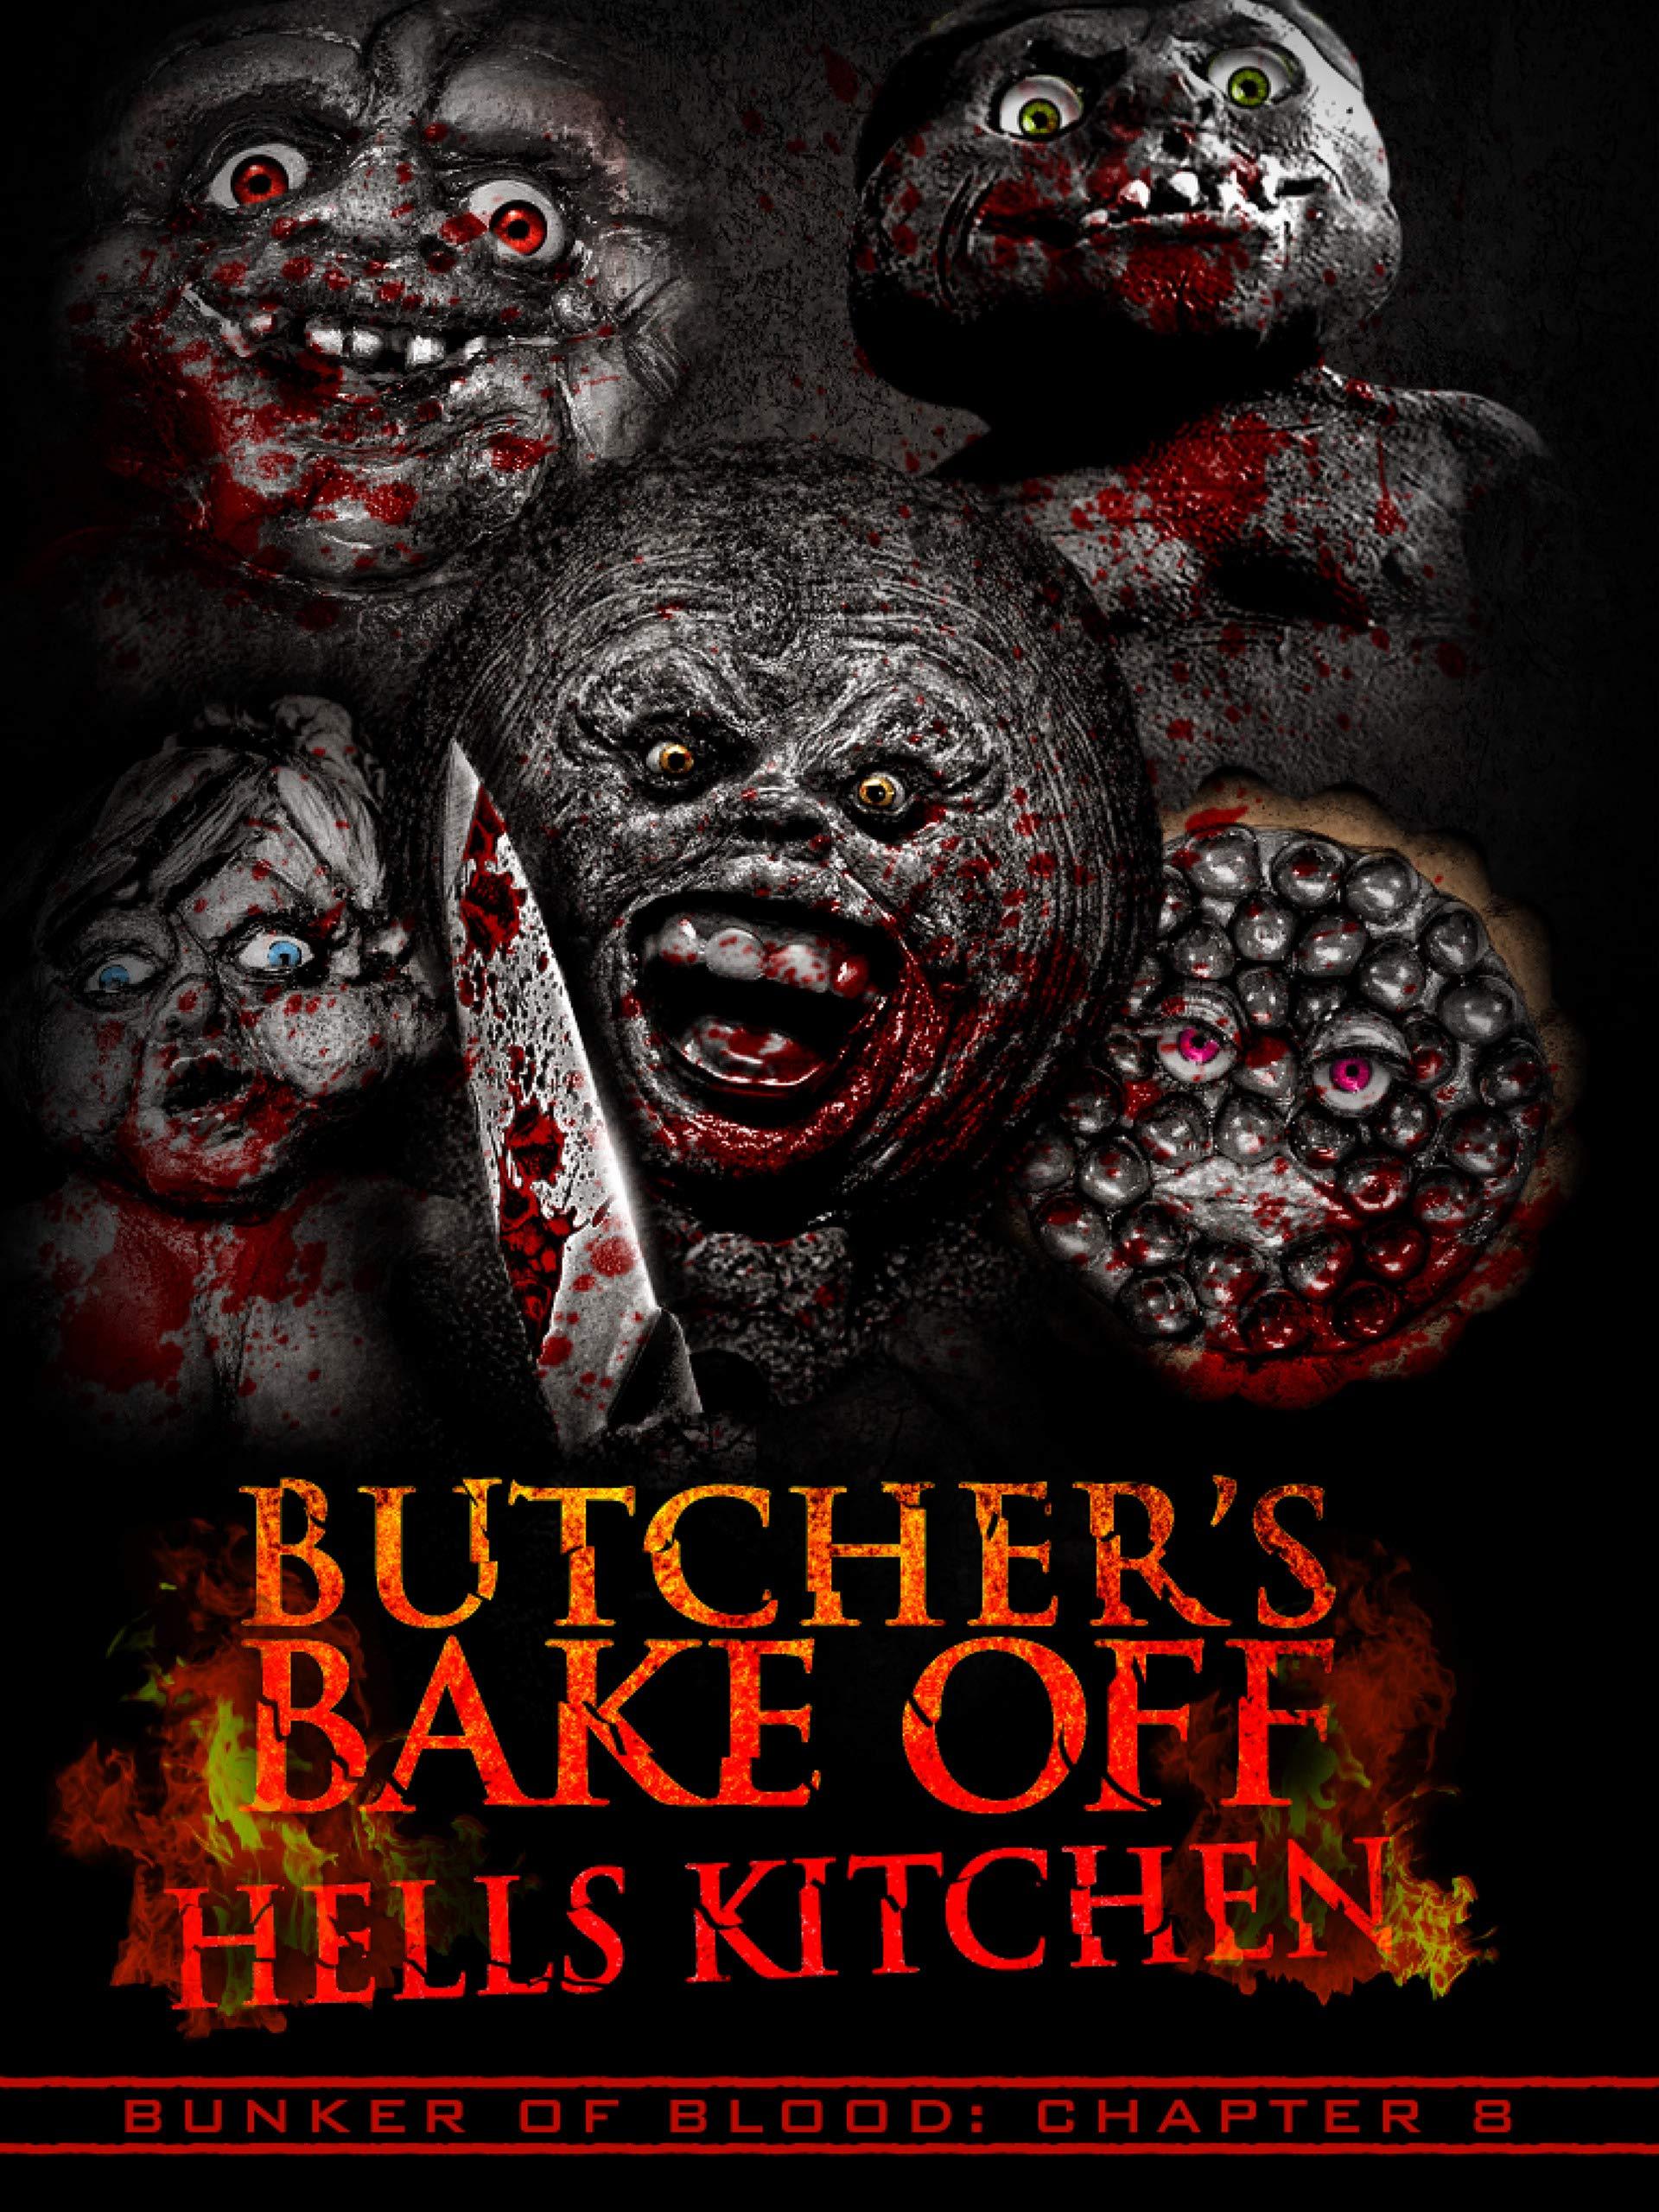 Butcher's Bakeoff: Hell's Kitchen